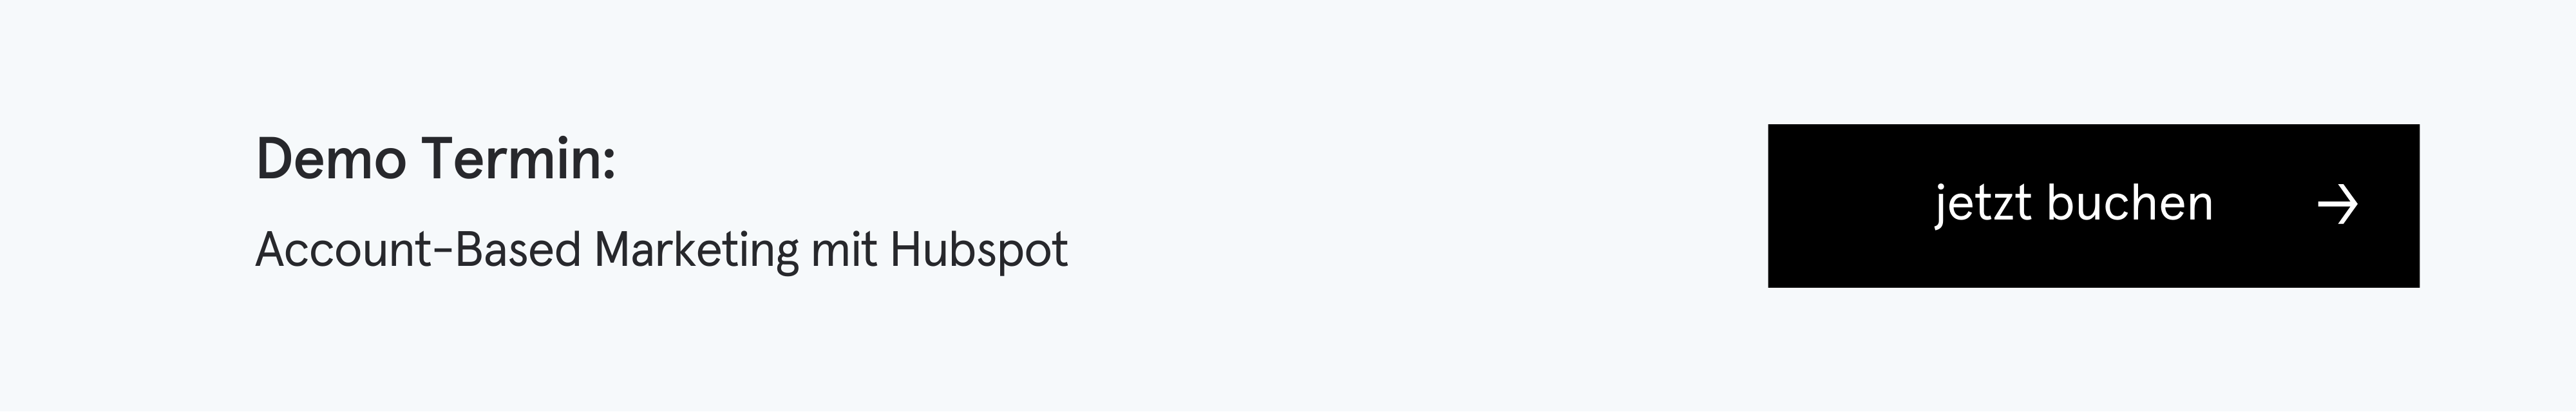 Demo-Termin: Account-Based Marketing mit HubSpot